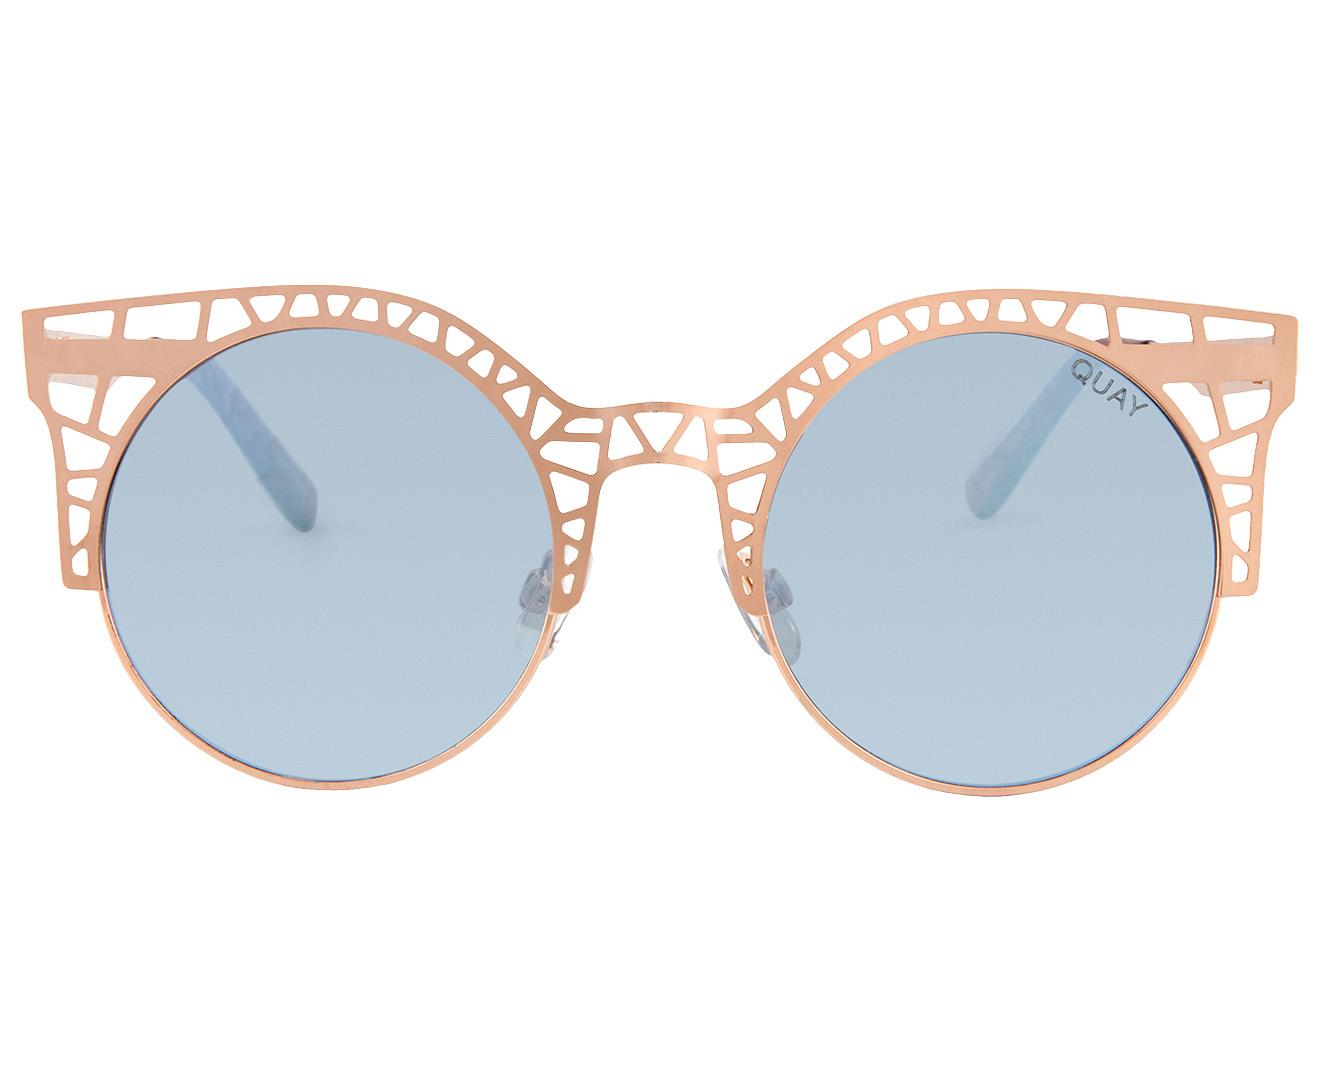 22ee8504623 Quay Australia Women s Fleur Sunglasses - Rose Gold Lilac